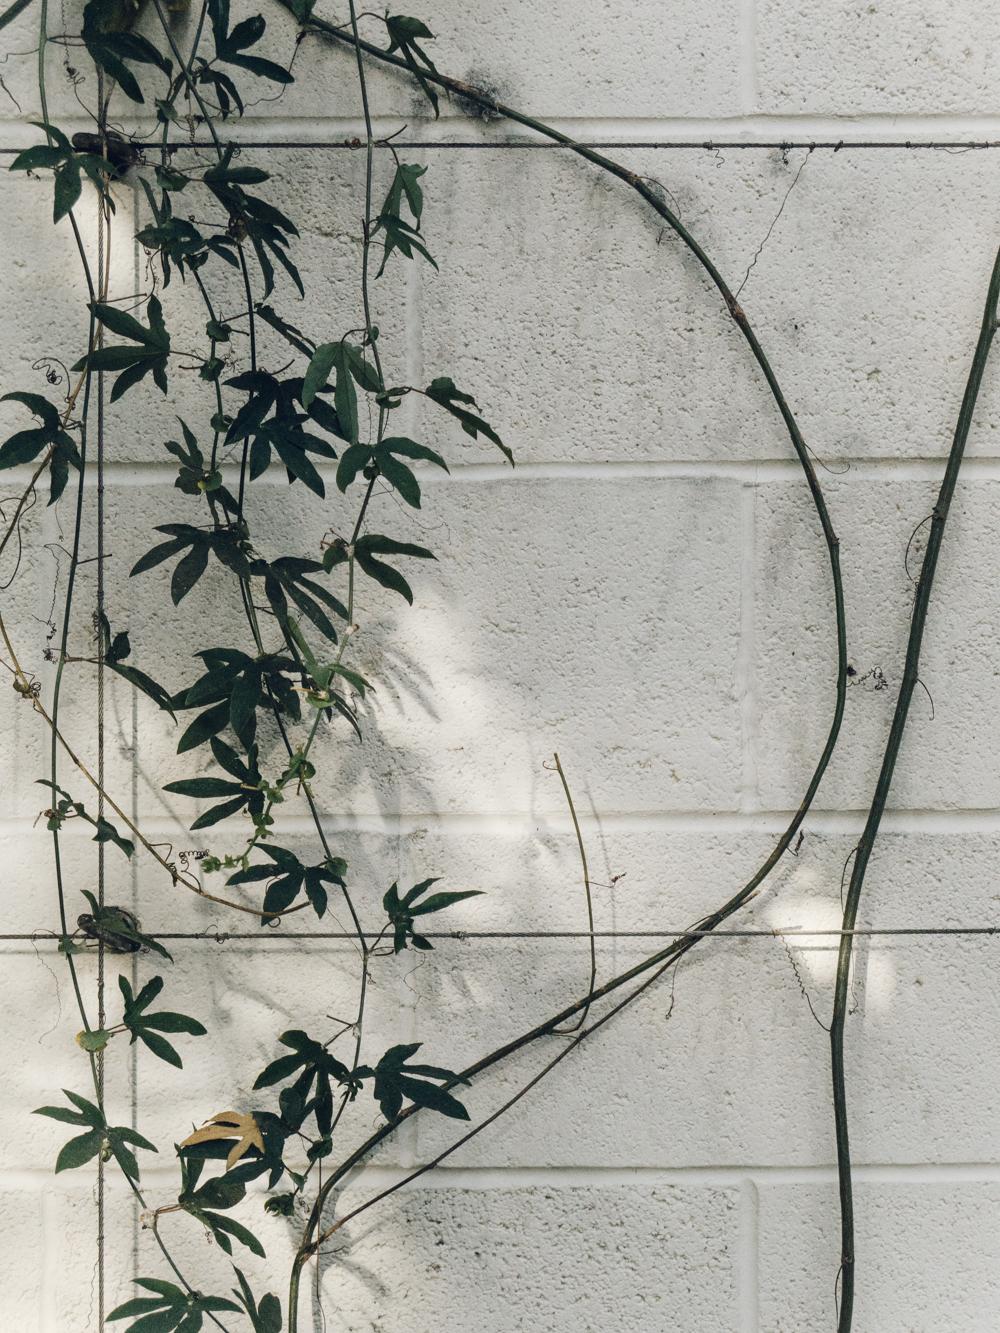 Haarkon Sheffield Botanical Gardens Glasshouse Tree Leaf Greenery